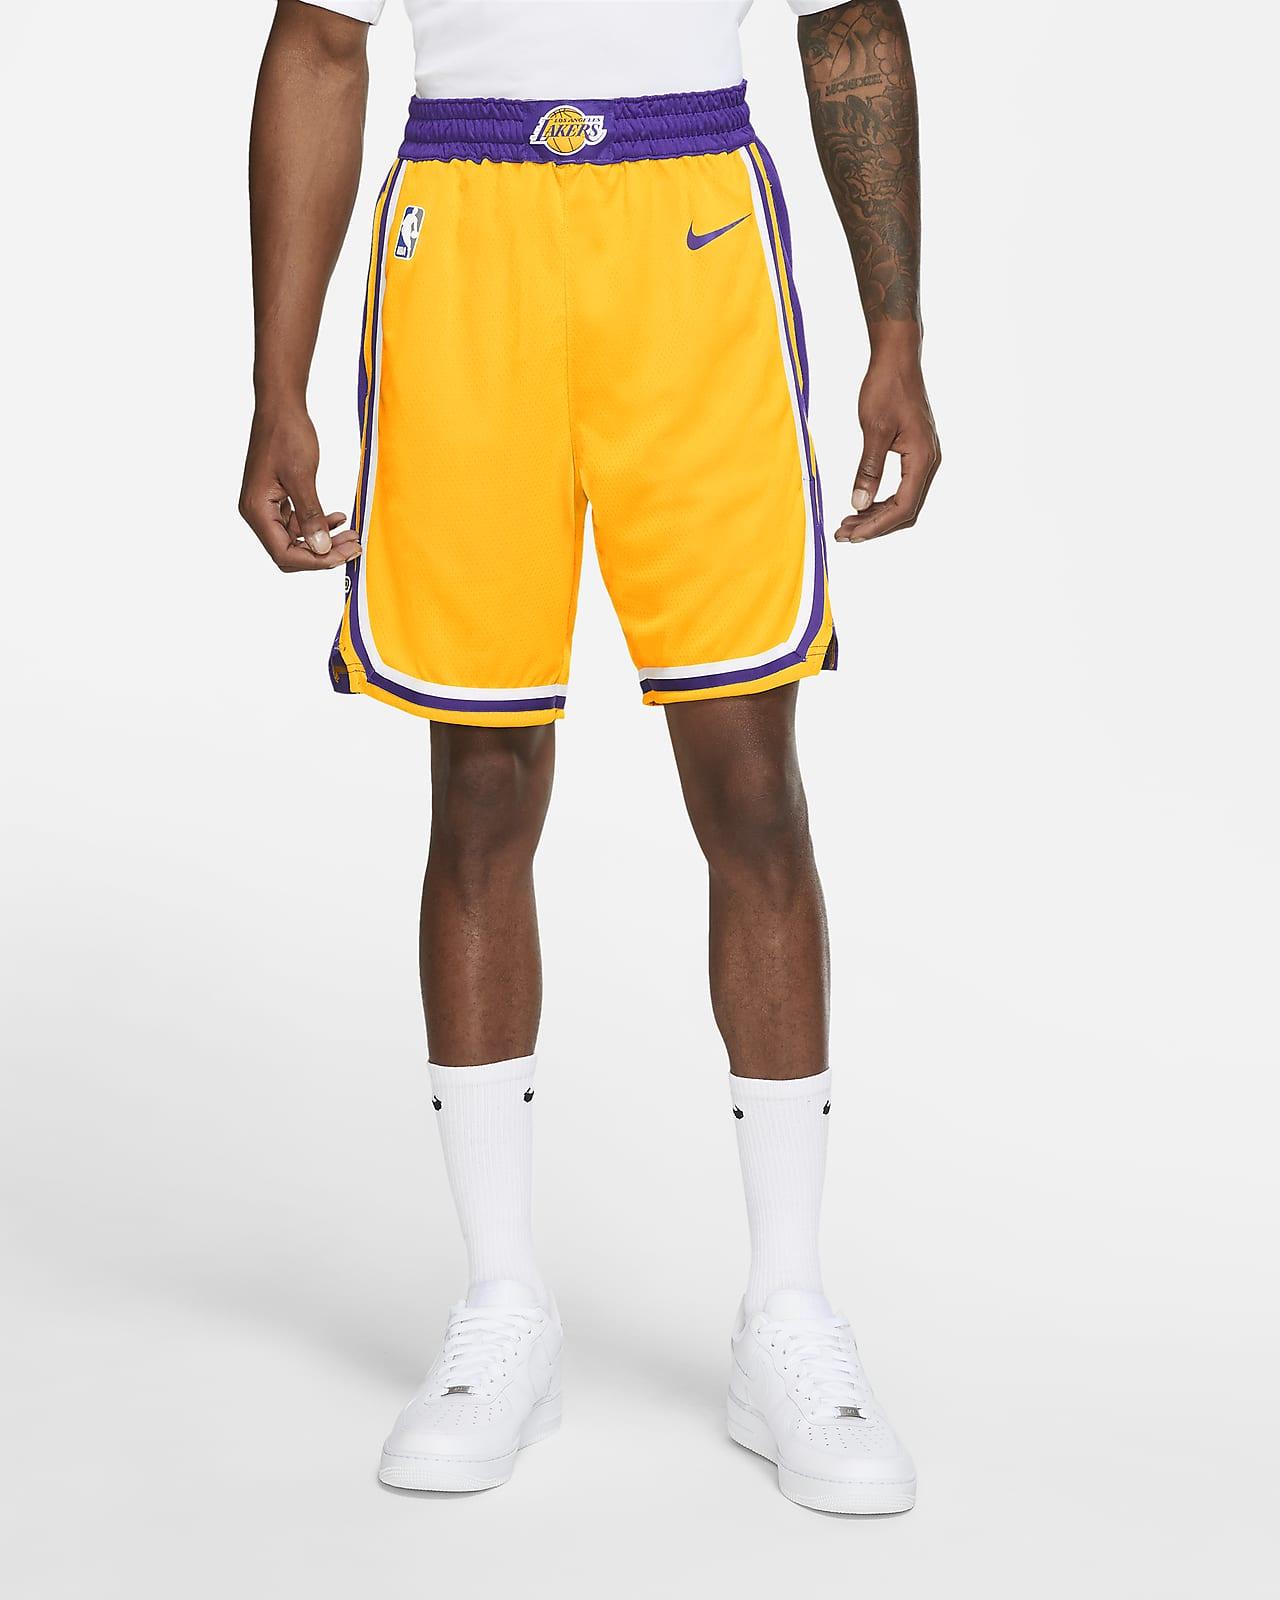 Shorts Nike NBA Swingman para hombre Los Angeles Lakers Icon Edition